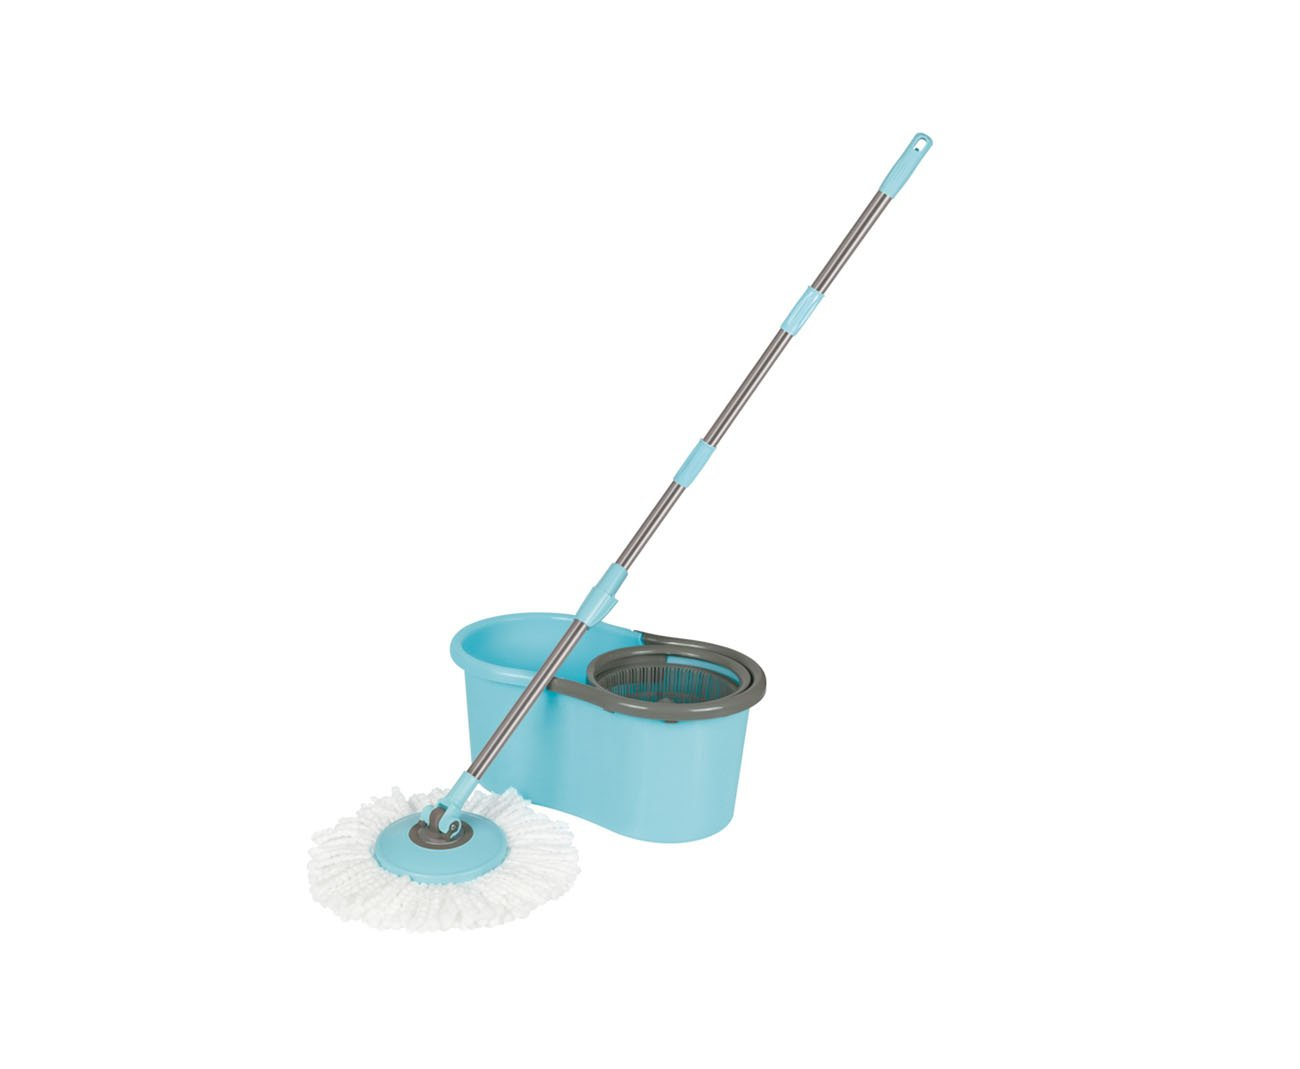 Conjunto Mop Spin - Esfregão + Balde - Limpeza Pratica - Mor